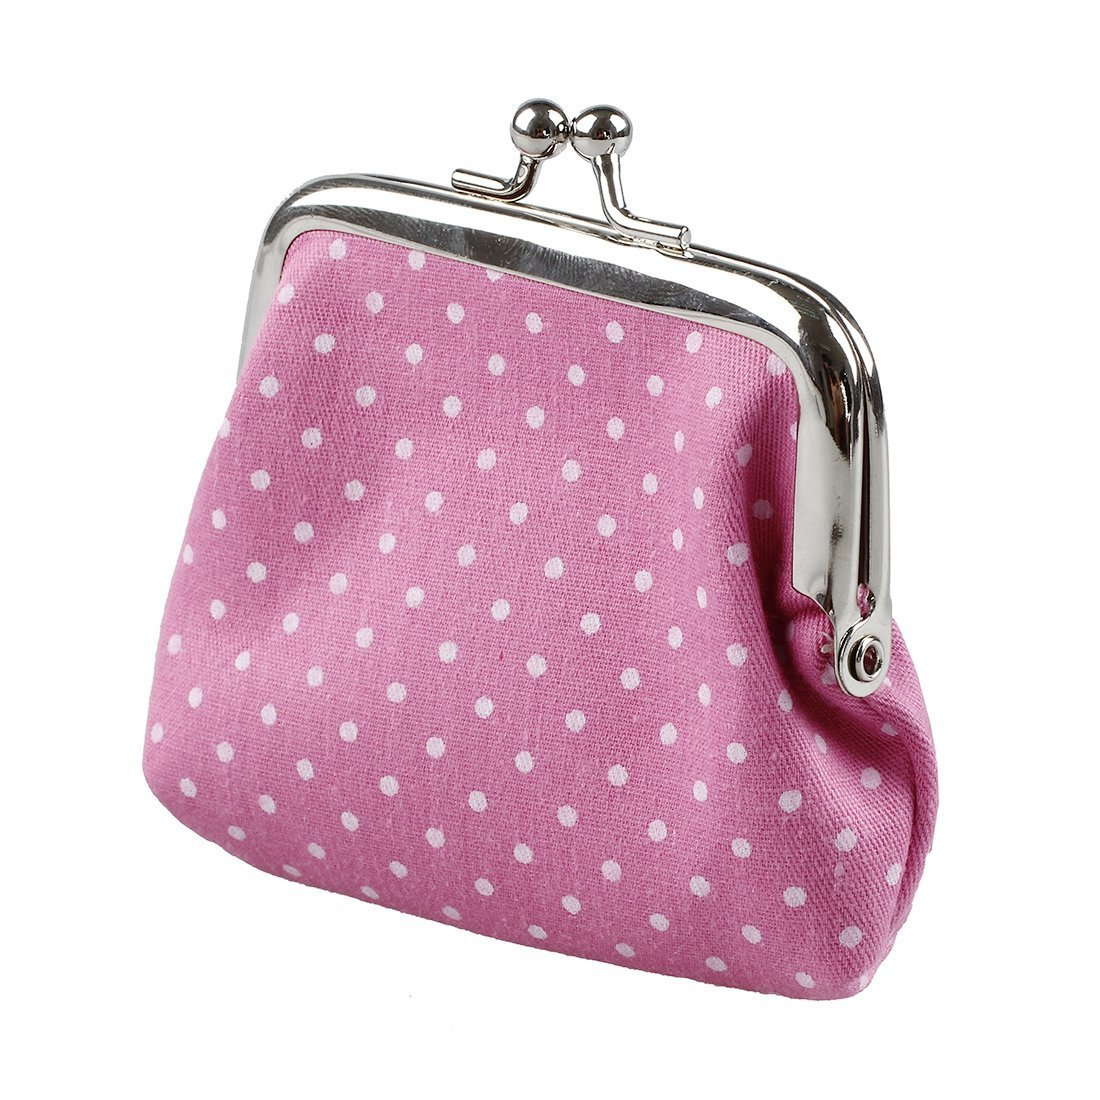 TOOGOO(R) Popular Cute girls Wallet Clutch Change Purse key/coins bag Mini Handbag Pouch Rose red 049337A5